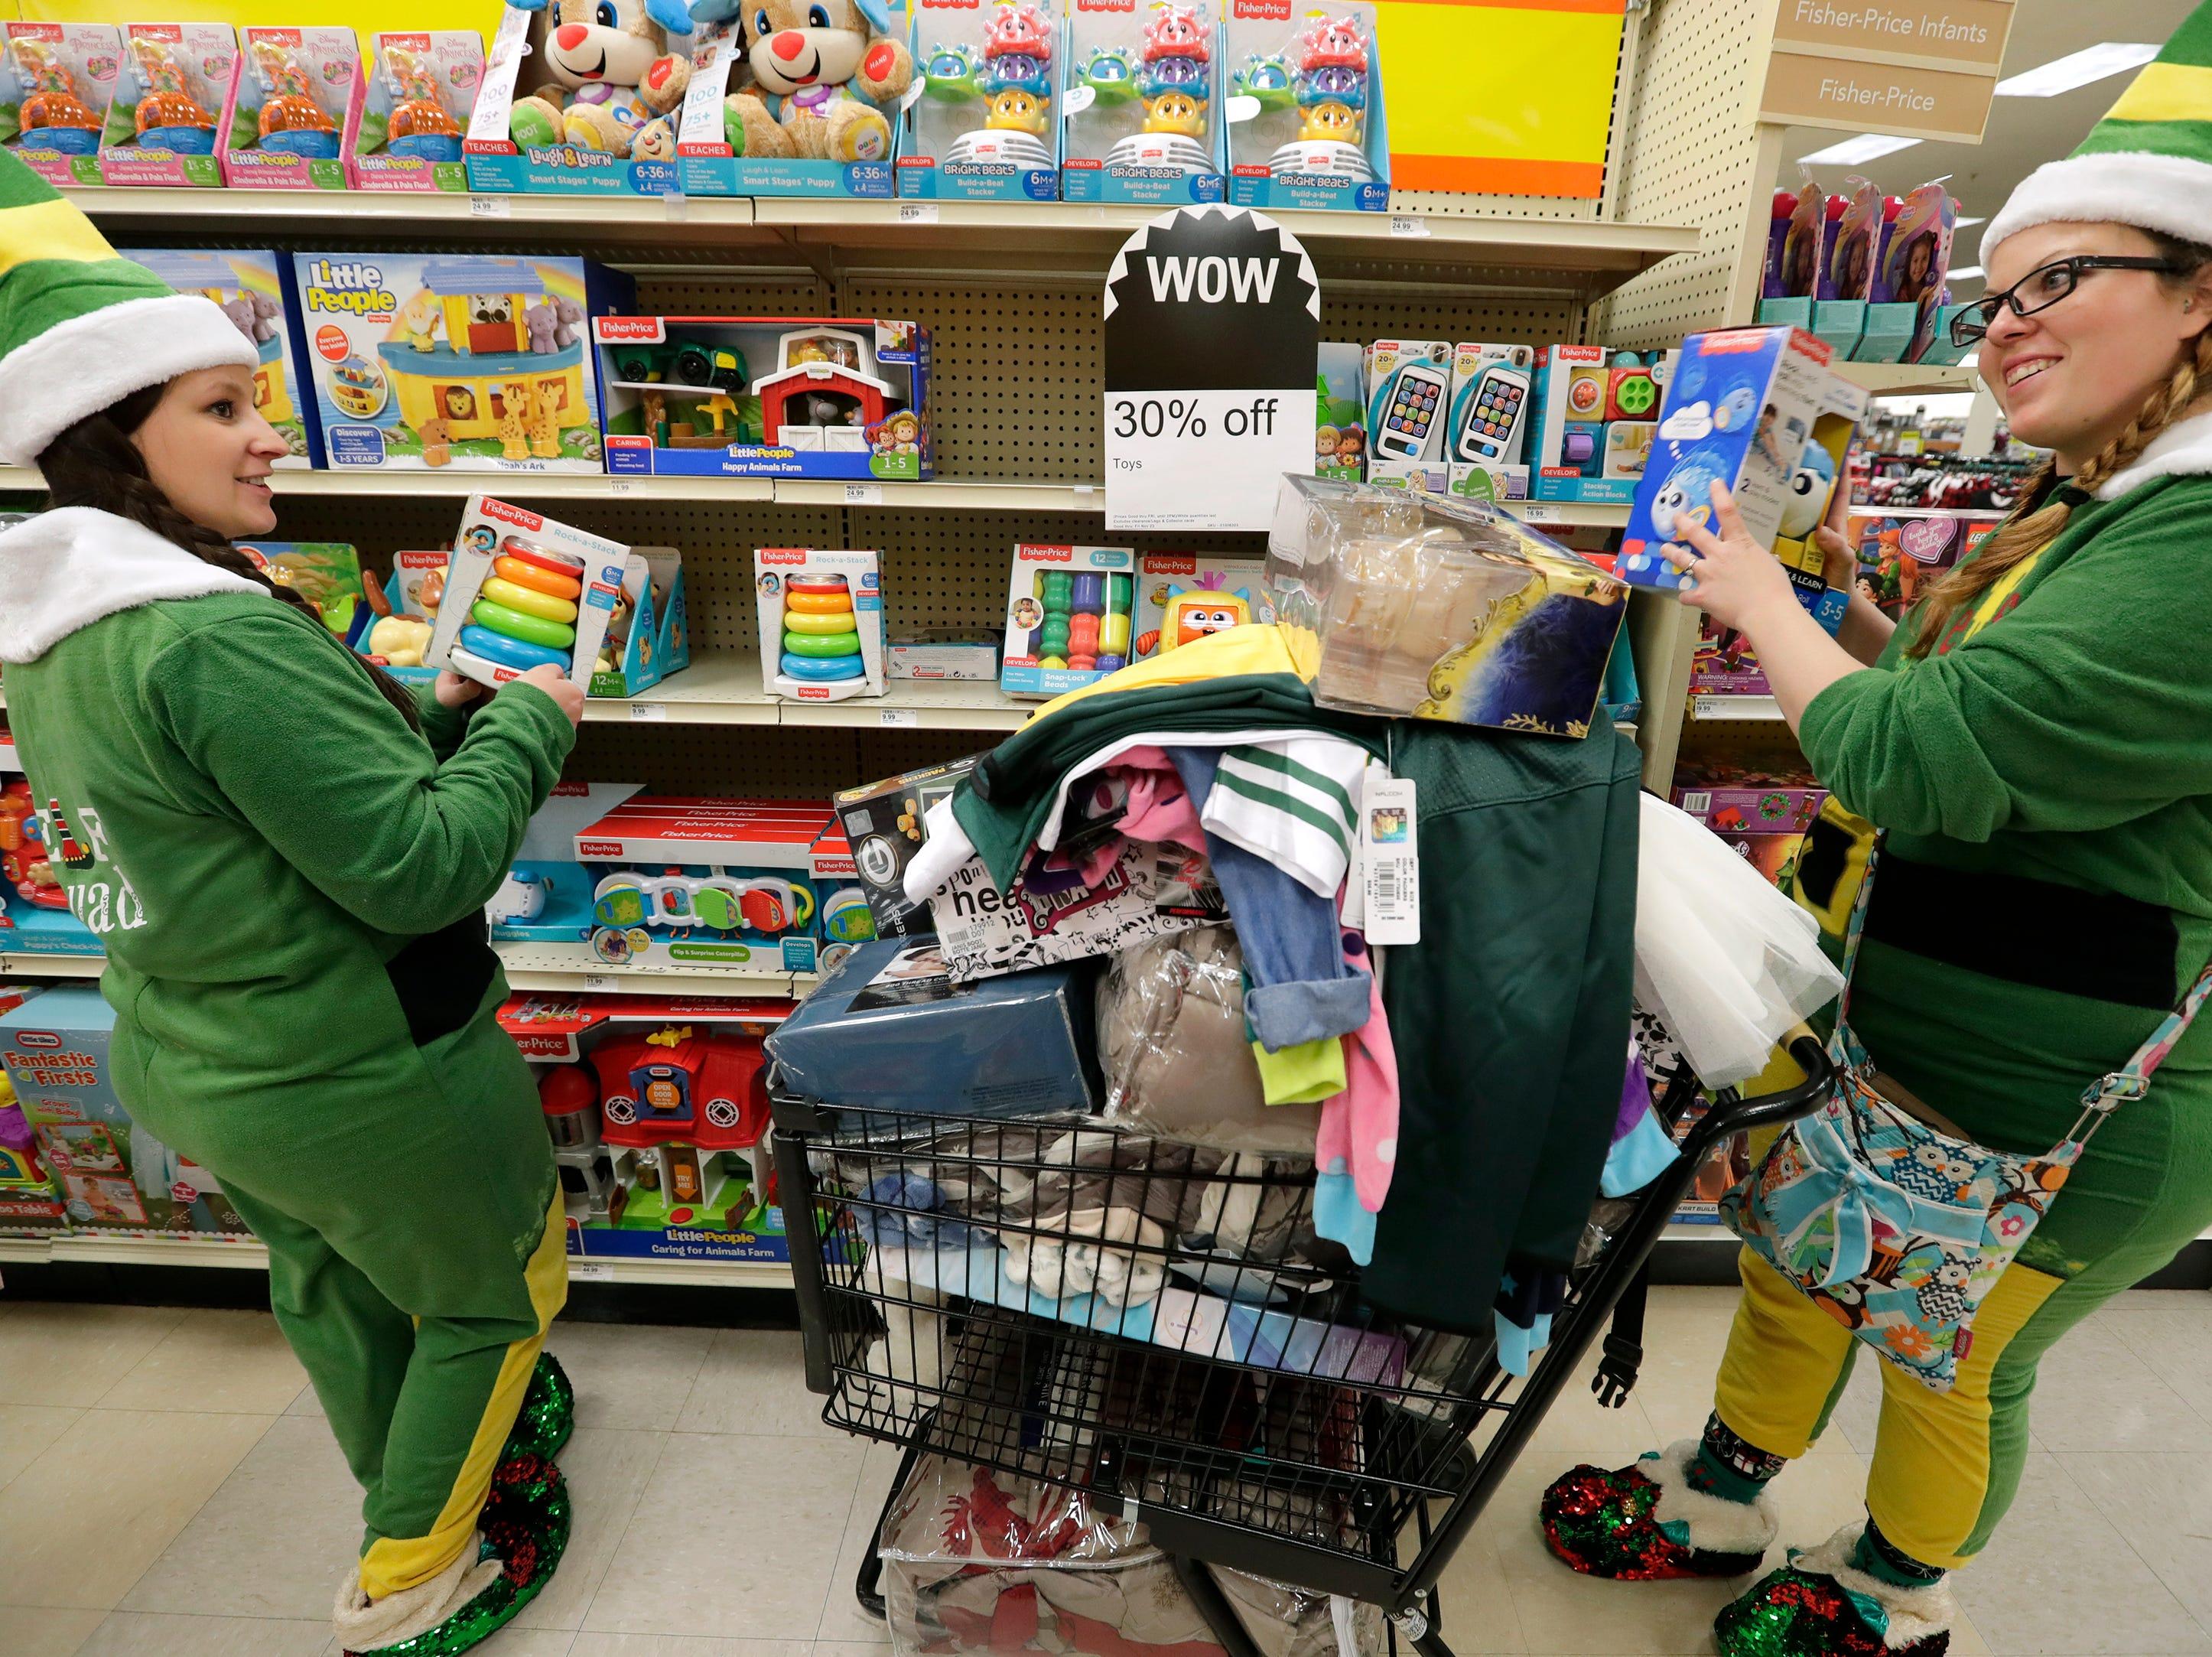 Dressed as elves, Morgan Dunbar, left, and Jennifer Hoagland shop for Black Friday deals at Shopko Thursday, November 22, 2018, in Appleton, Wis. Dan Powers/USA TODAY NETWORK-Wisconsin